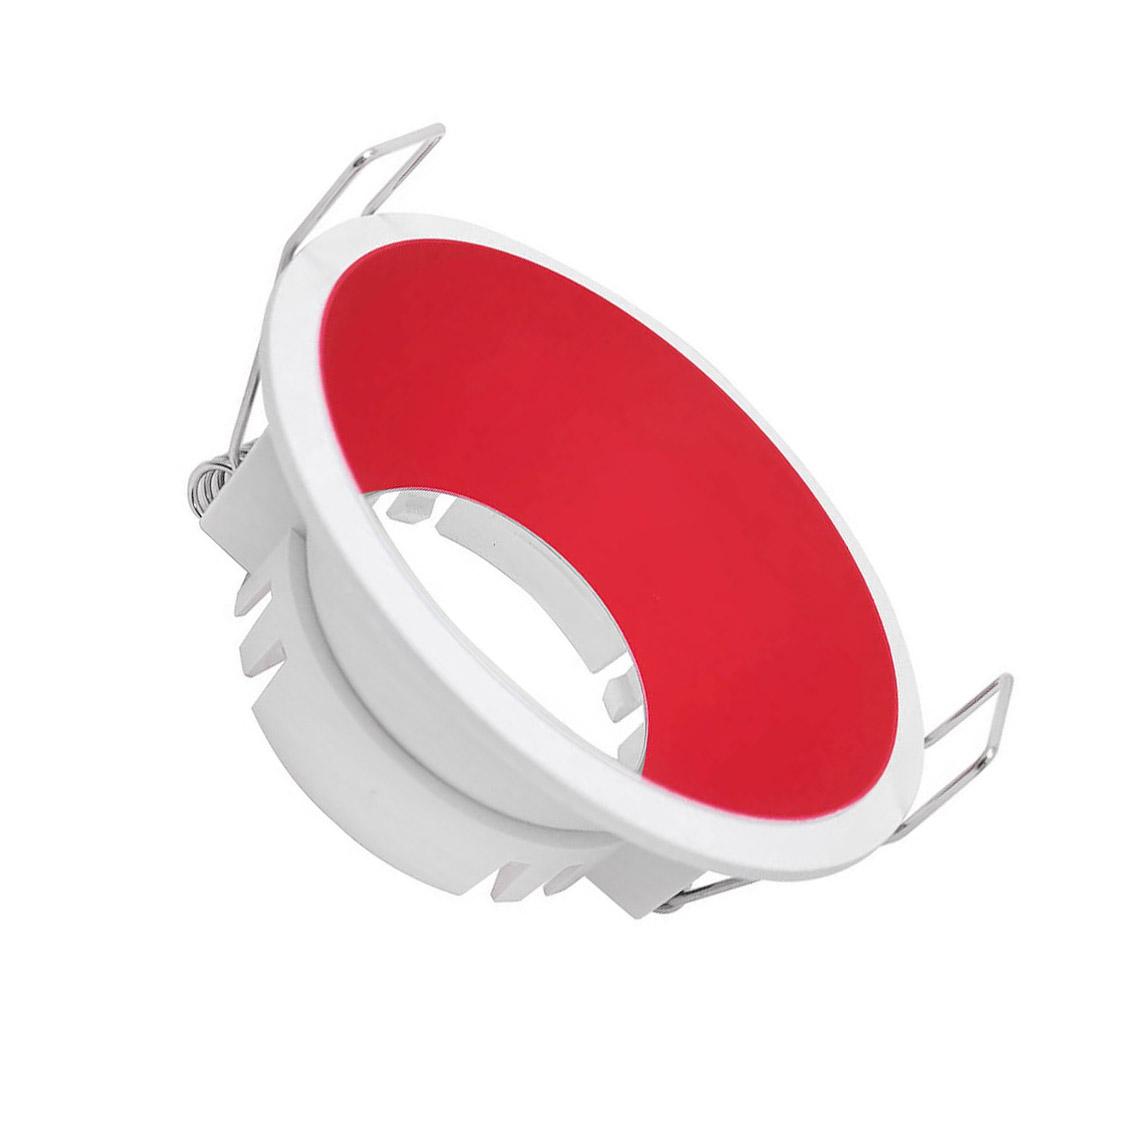 Spot fixo redondo Vermelho URG19